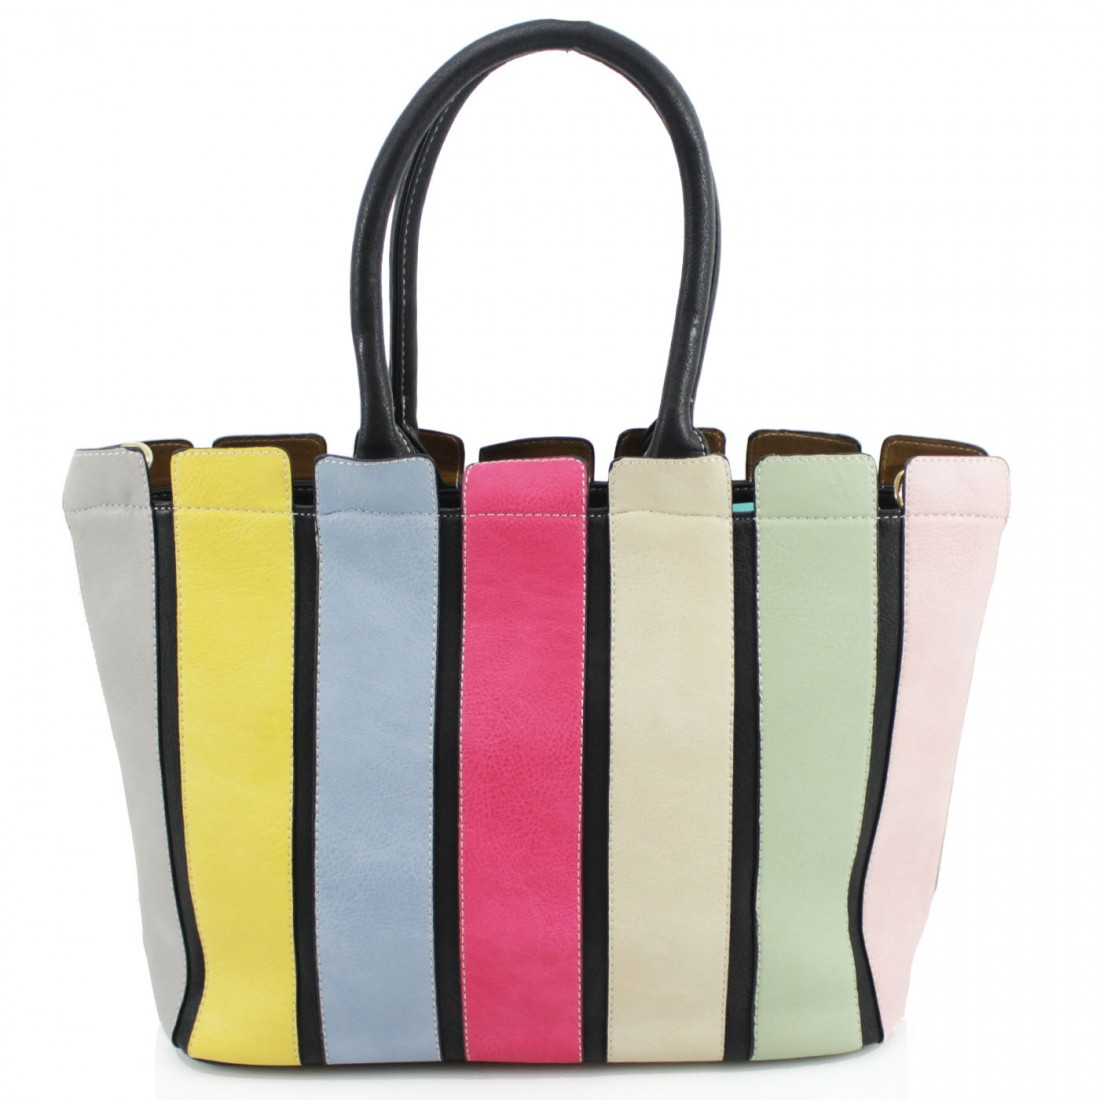 Multi Colour Striped Handbag - Black